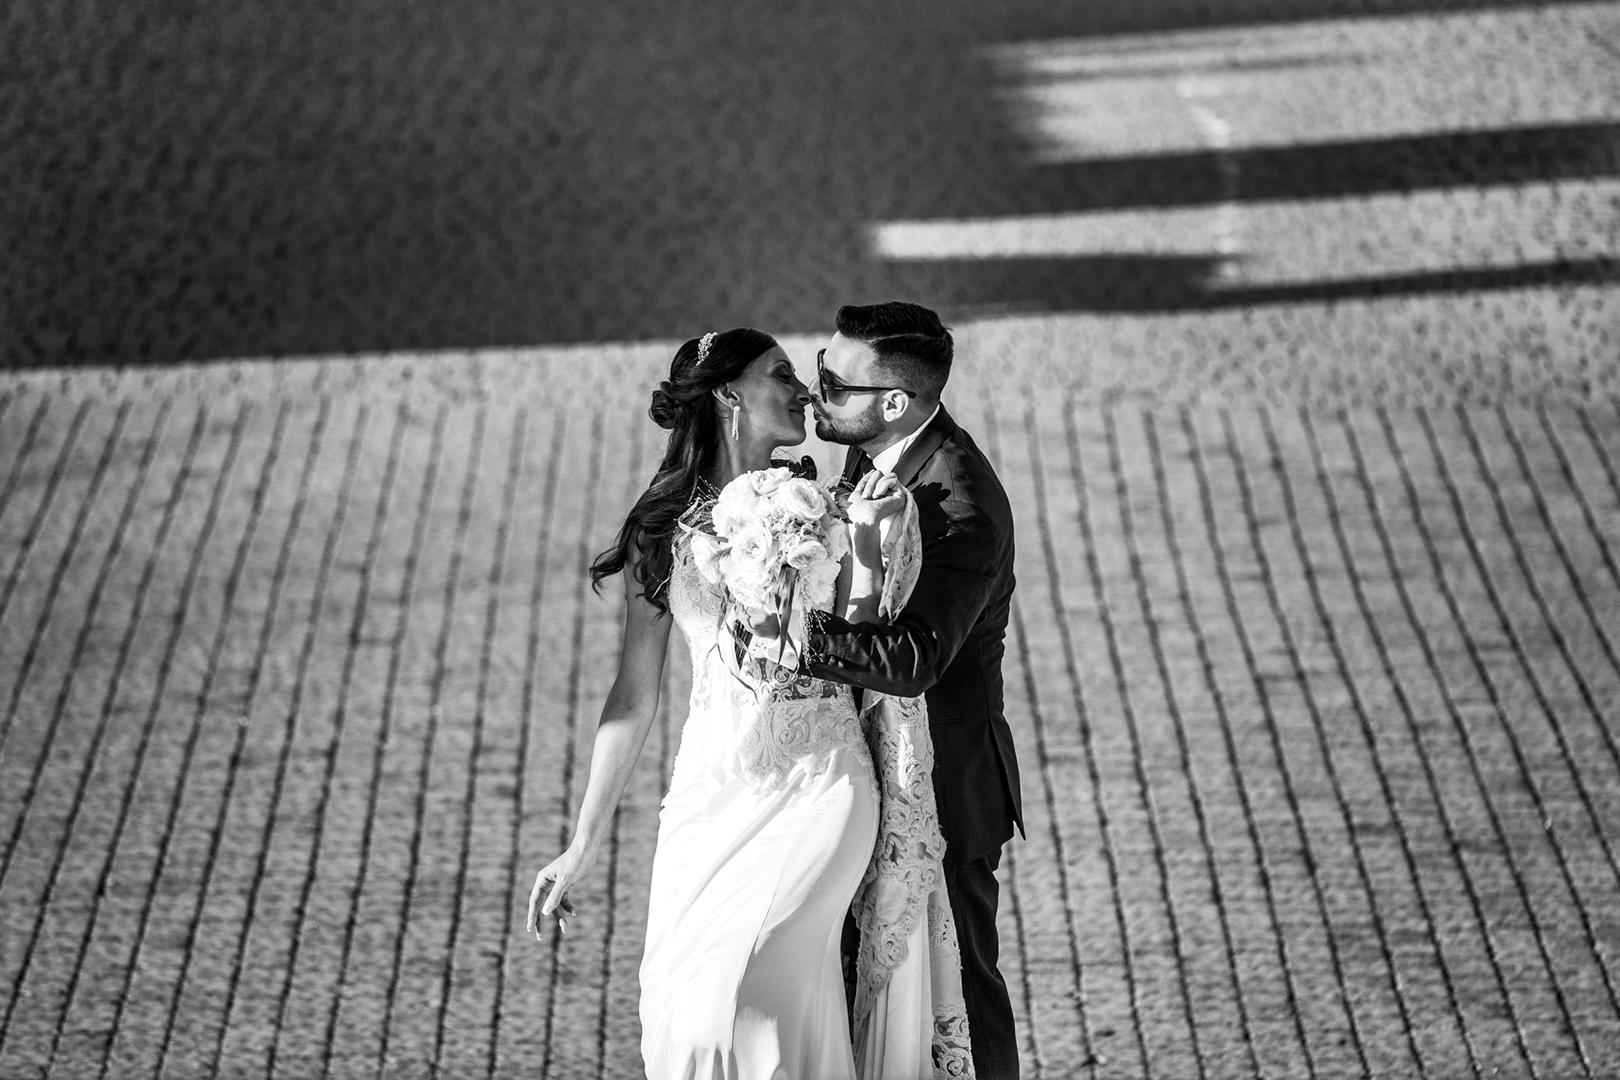 31 gianni-lepore-fotografo-matrimonio-reportage-sala-riceimento-bride-groom-weddingday